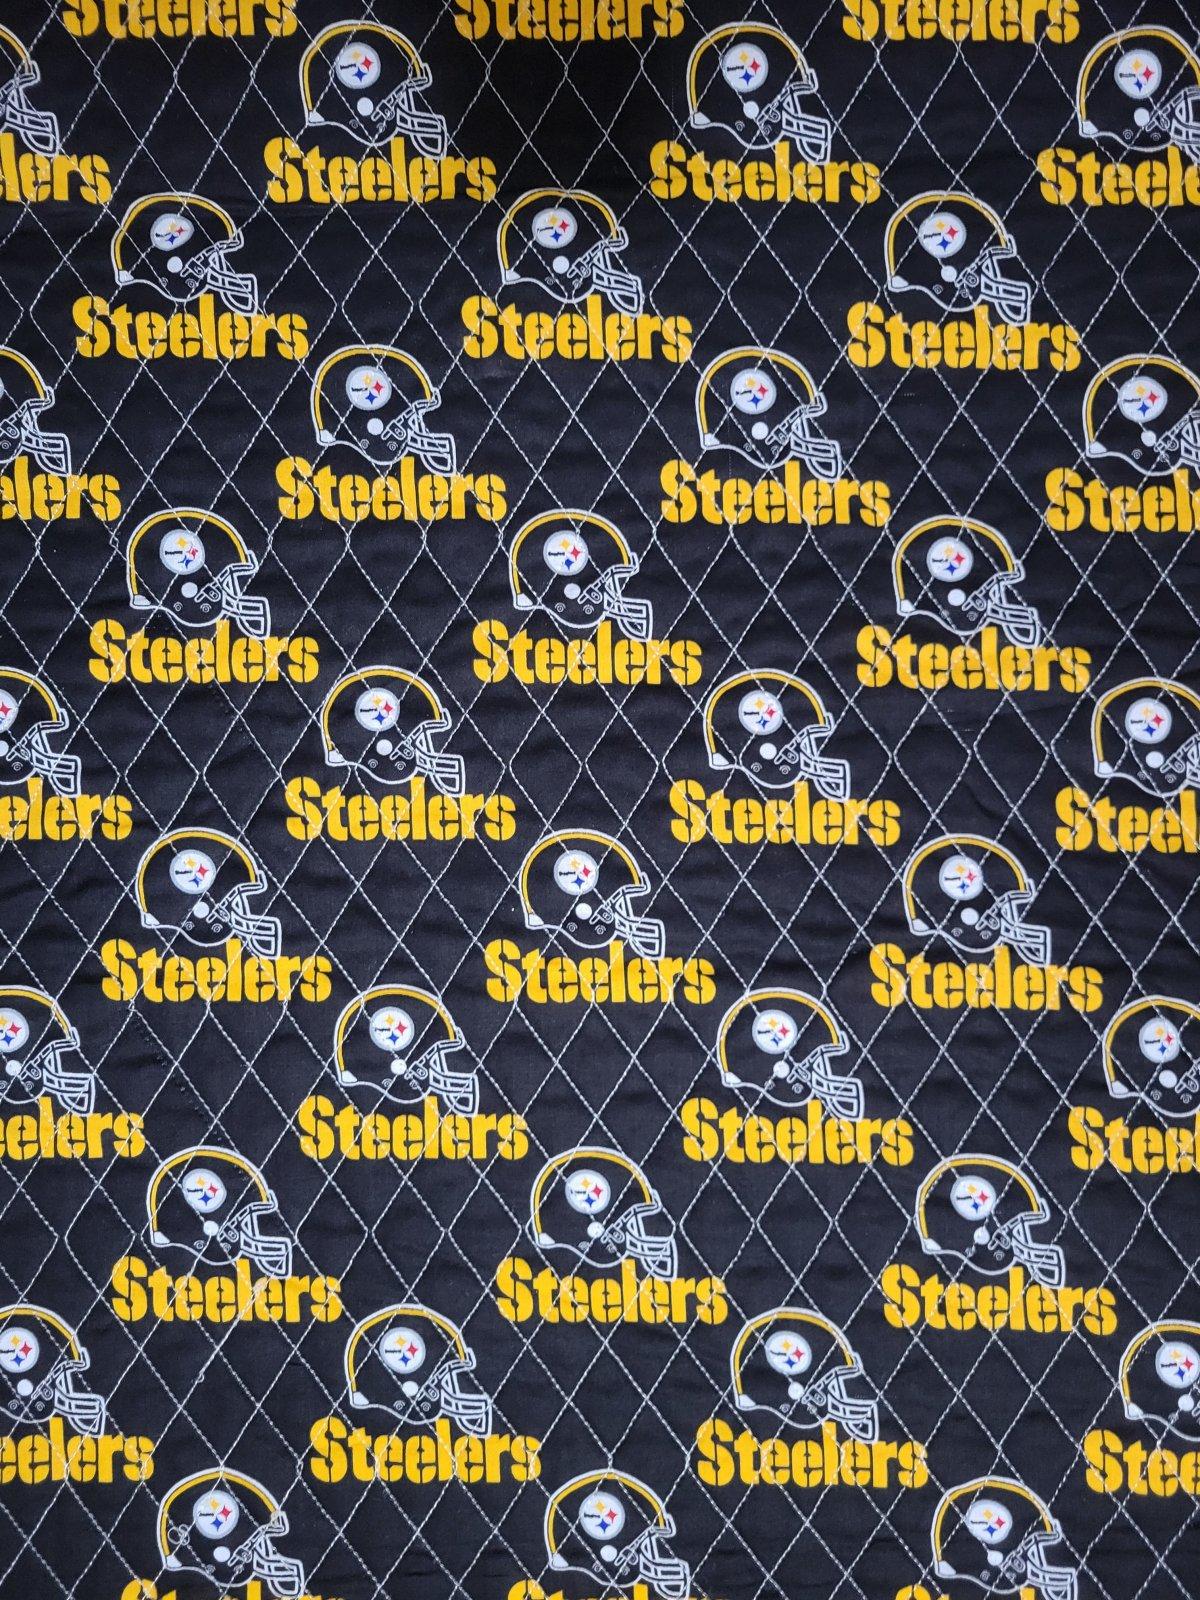 DFQ NFL Logo Pittsburgh Steelers A522 Black